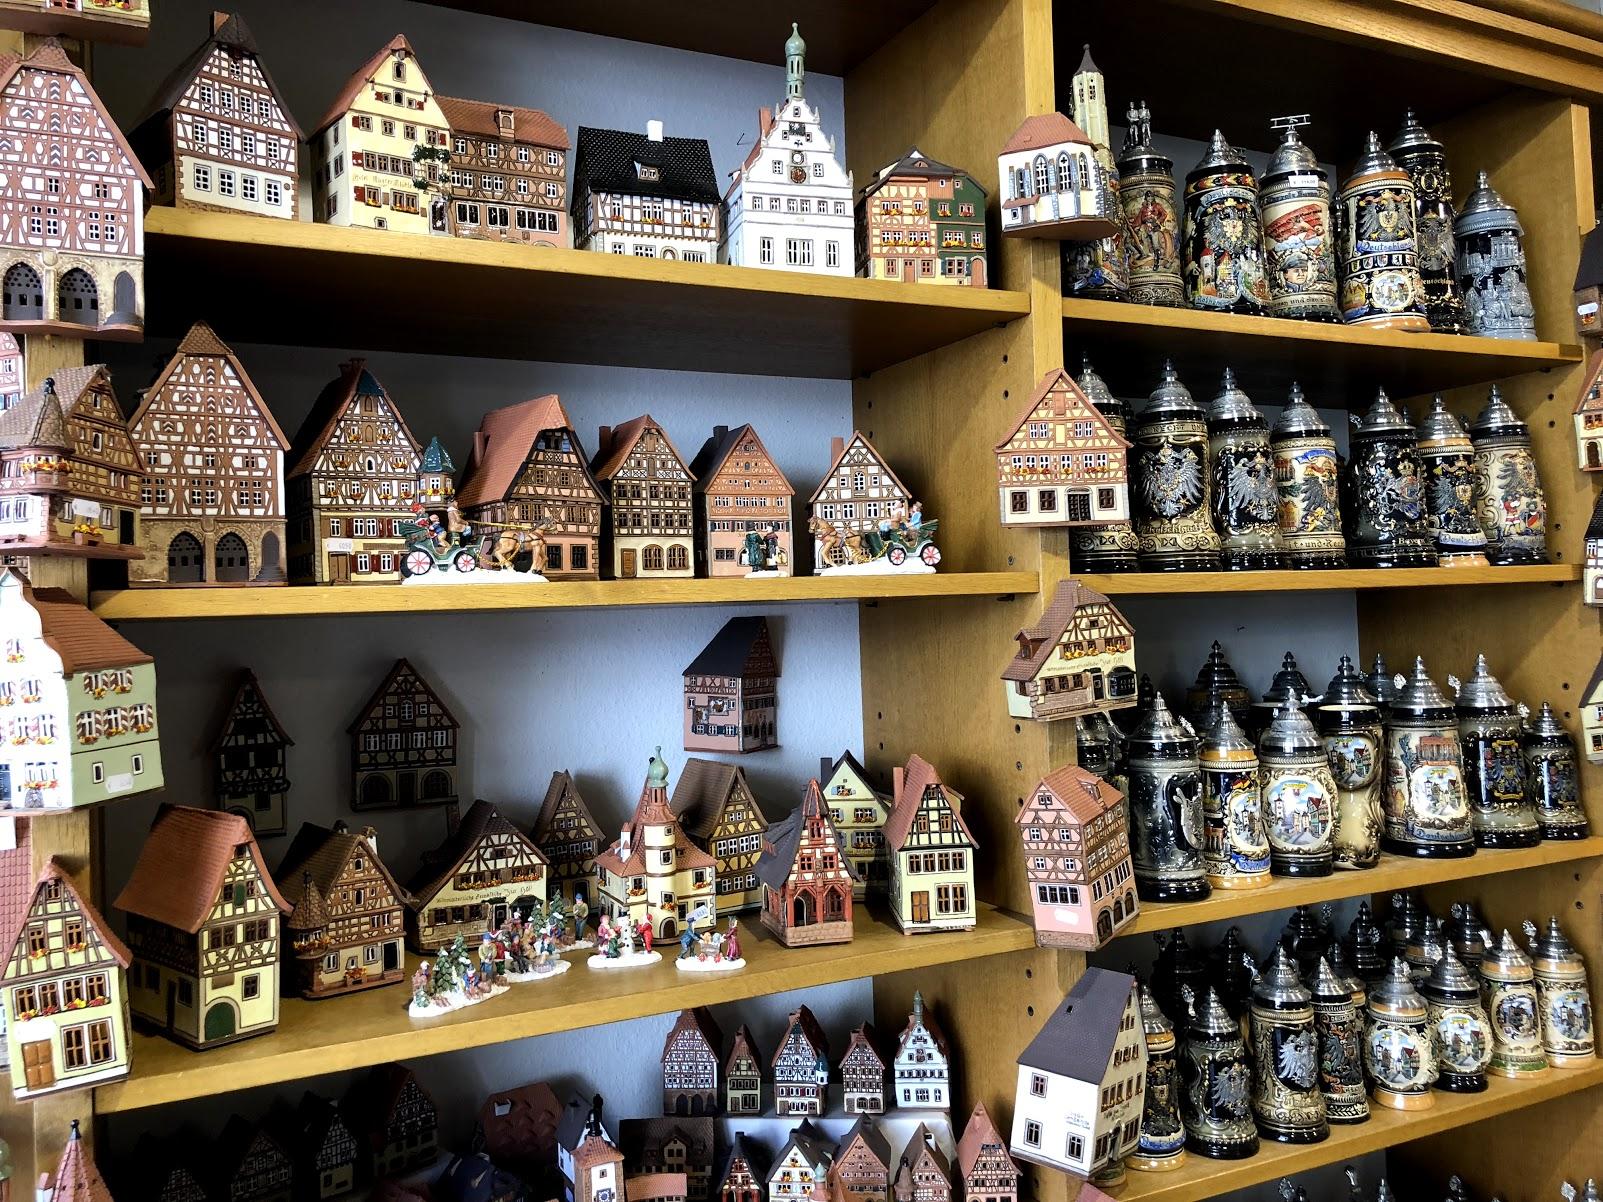 Rothenburg ob der Tauber souvenir shop